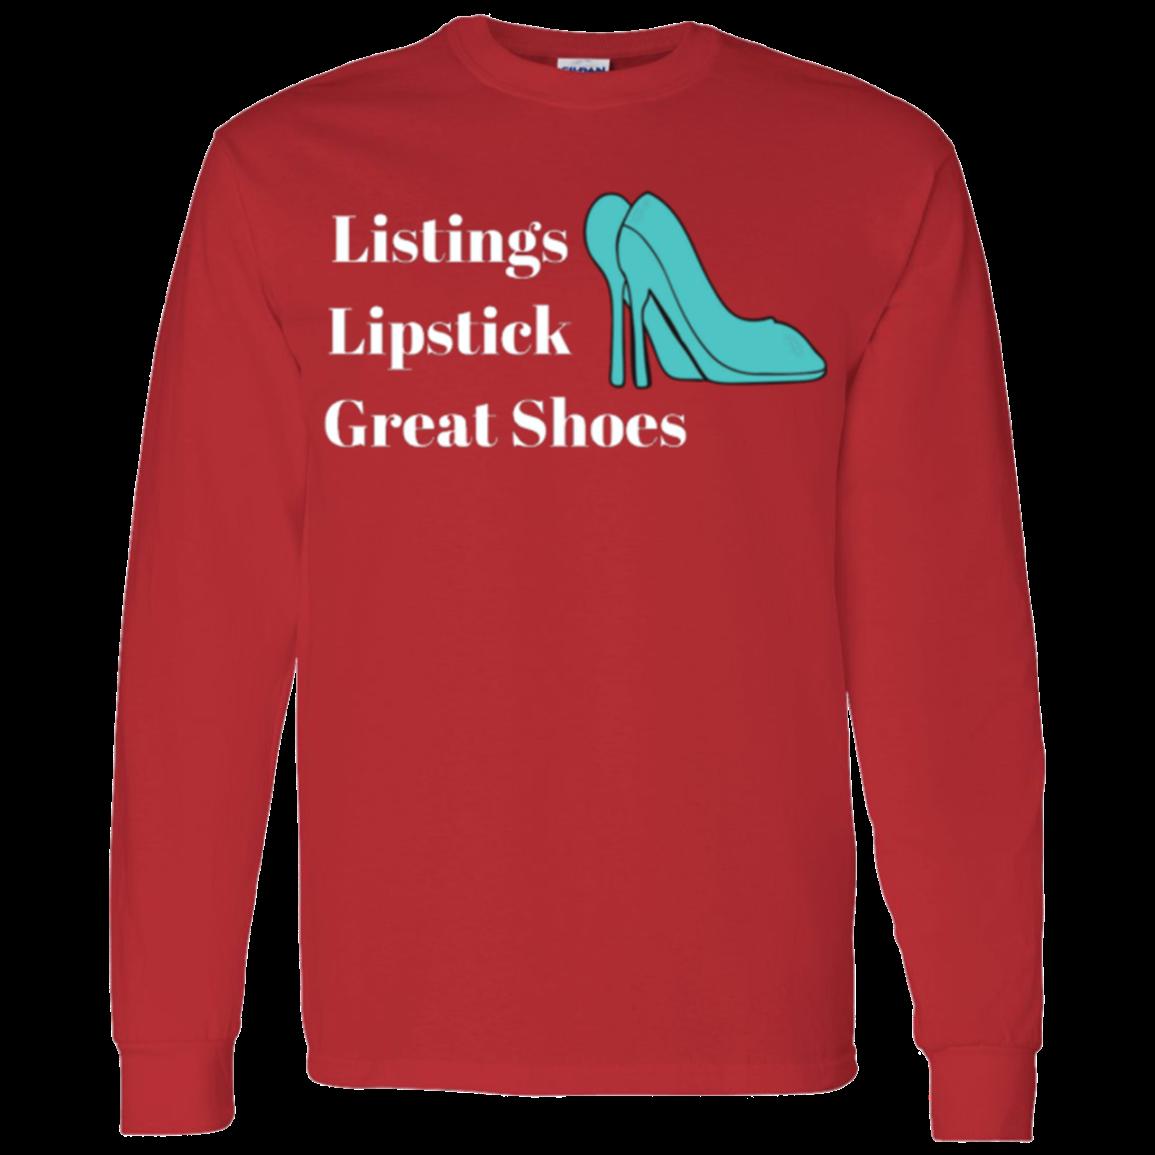 Listing, lipstick, teal shoes Unisex Basic Long Sleeve